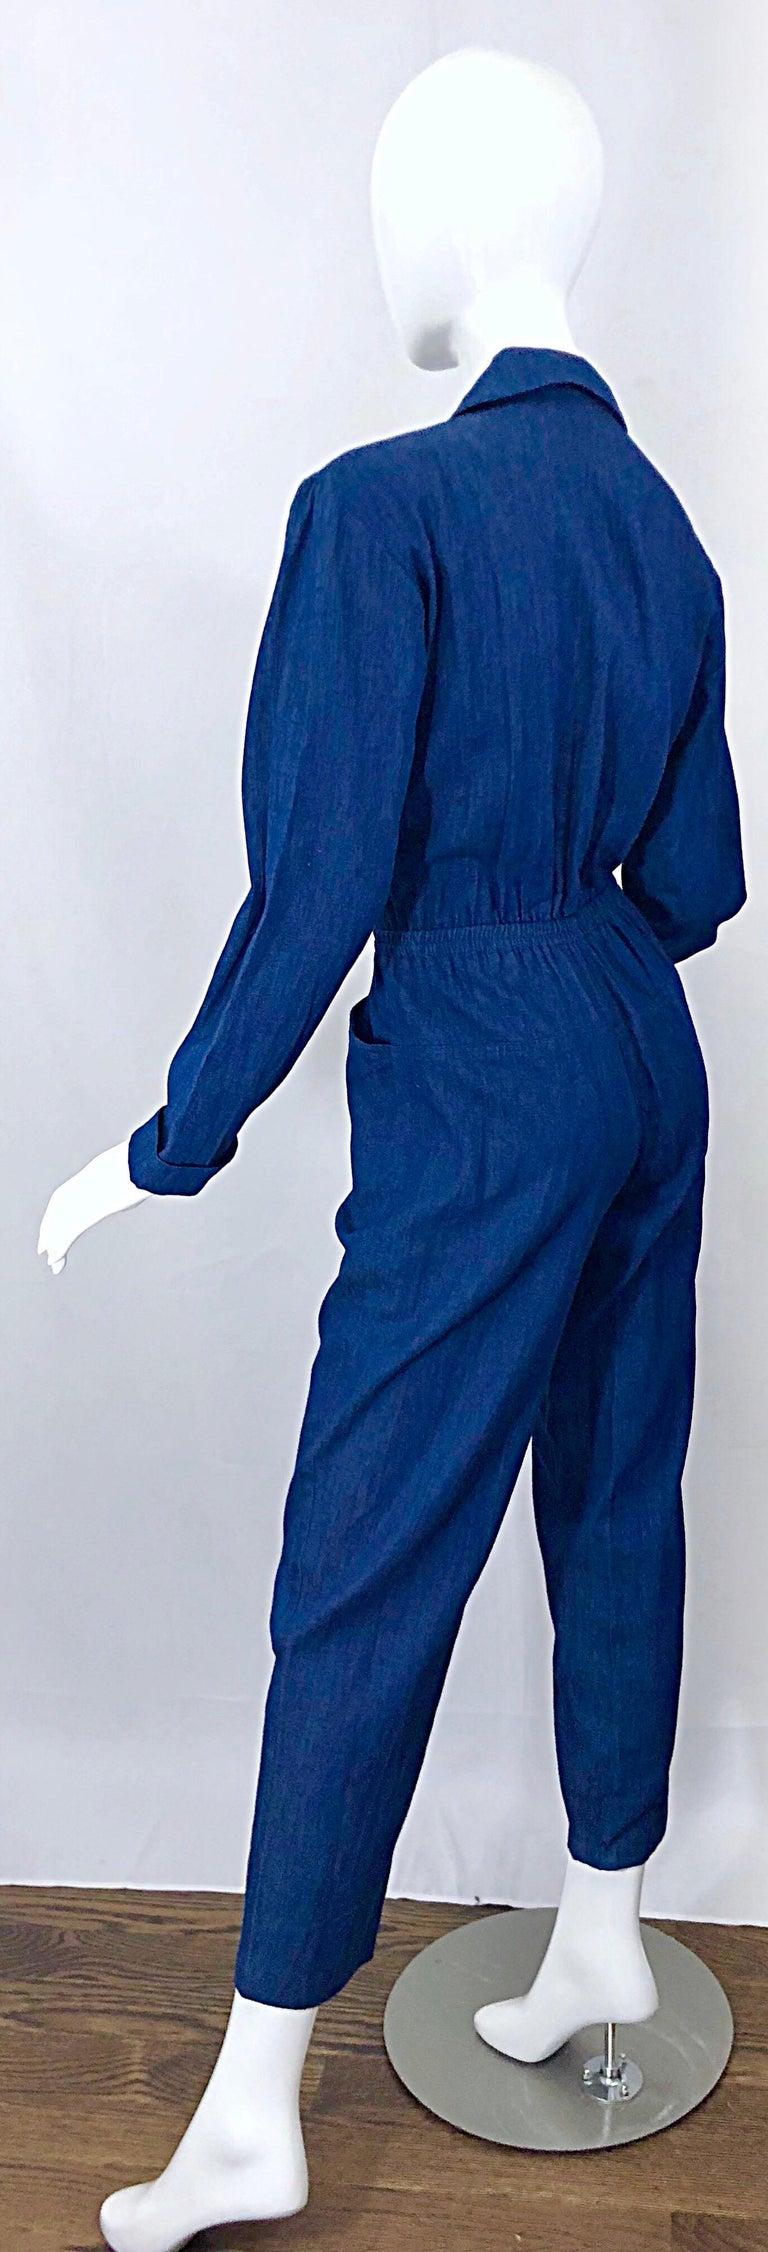 Amazing 1990s French Designer Blue Jean Denim + Rhinestone Pear Vintage Jumpsuit For Sale 3